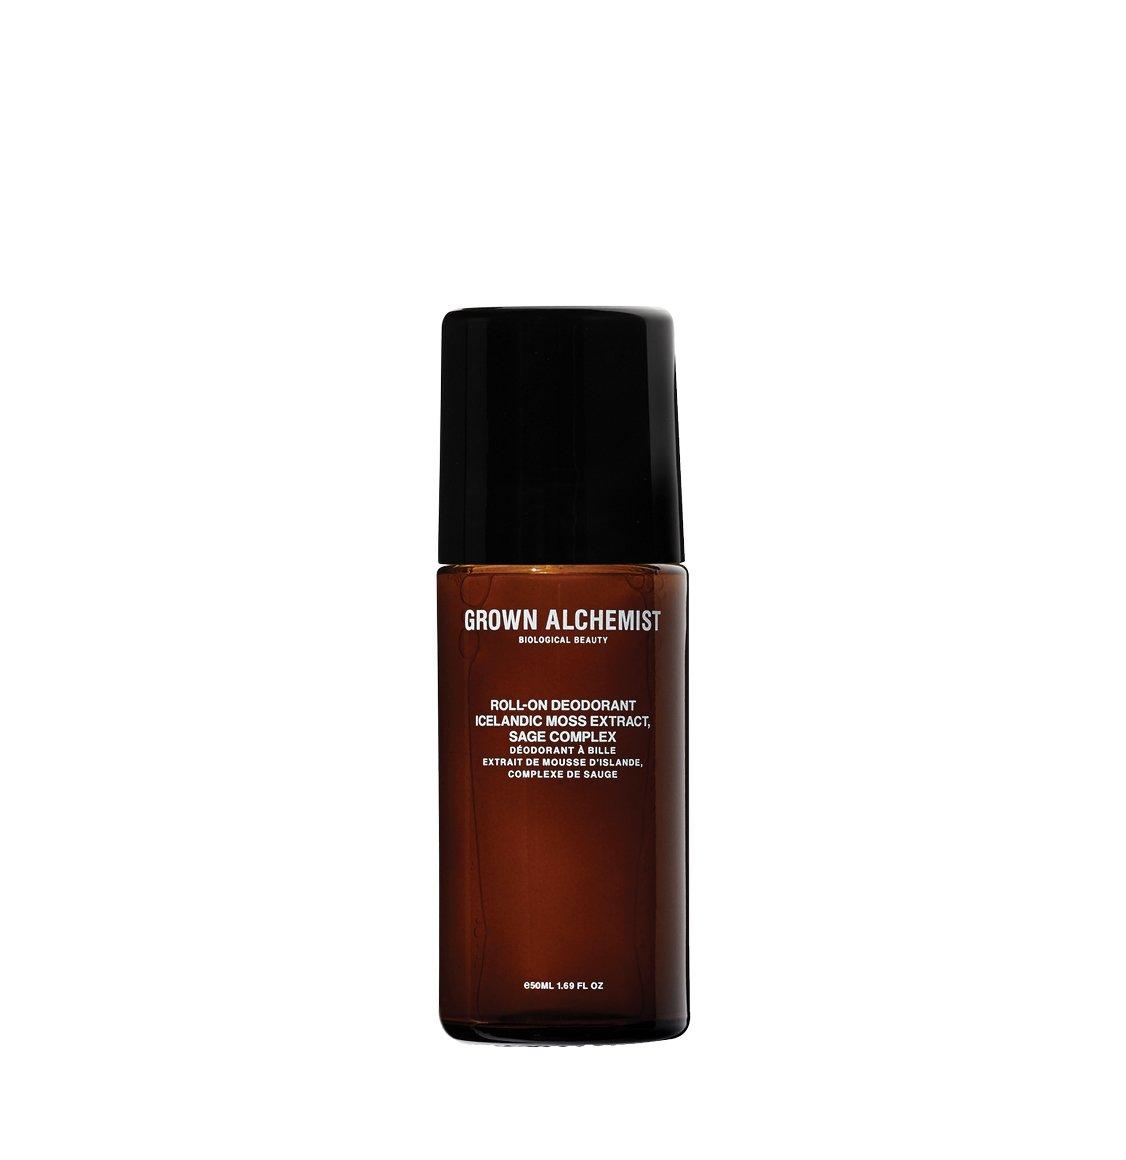 Grown Alchemist Roll-On Deodorant 50ml